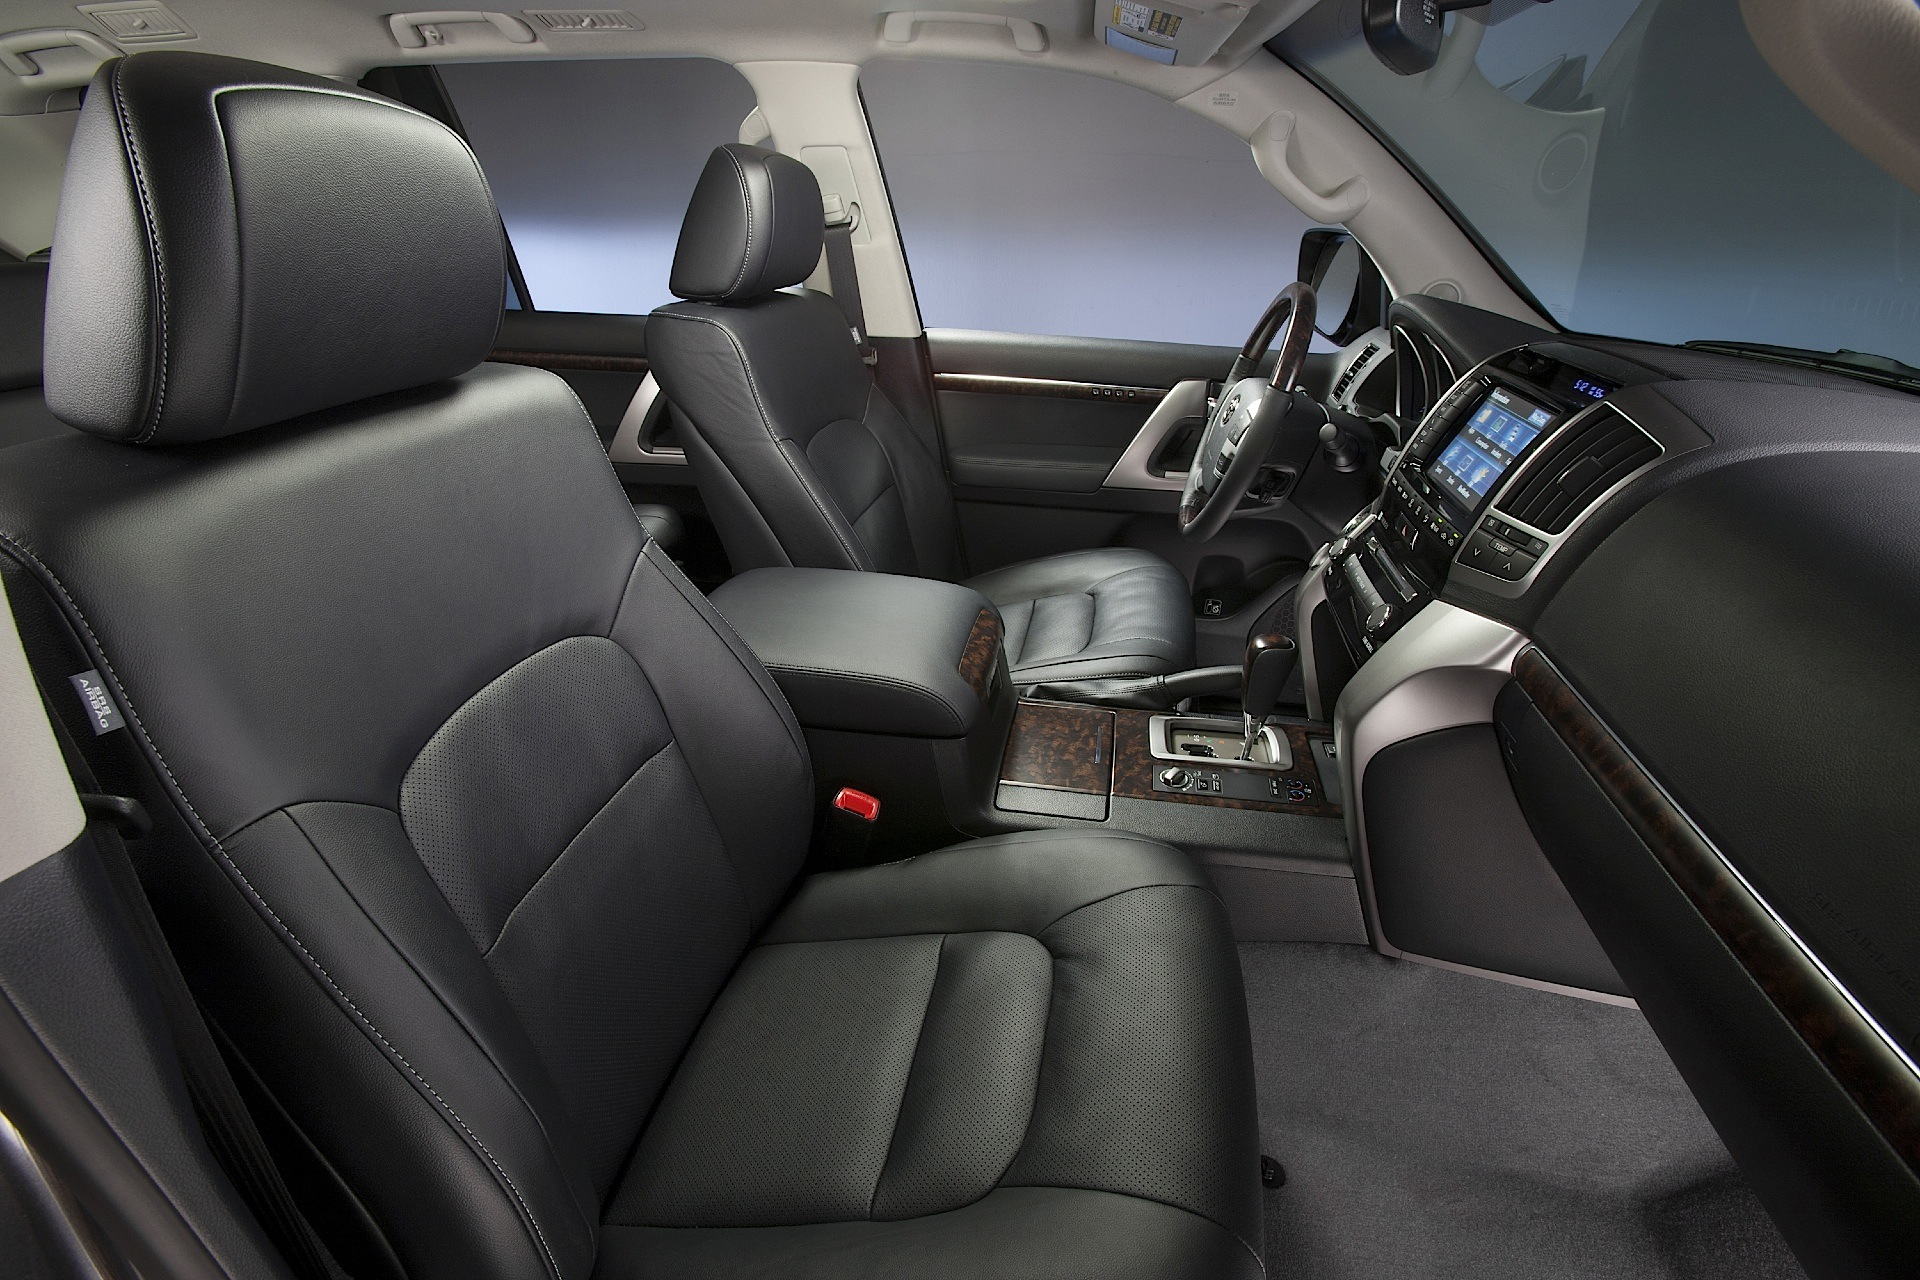 Nd Gen Prius Interior moreover Puntoelx A furthermore Toyota Prius V Prius further Toyota Land Cruiser V besides Toyota Land Cruiser Doors. on toyota prius interior